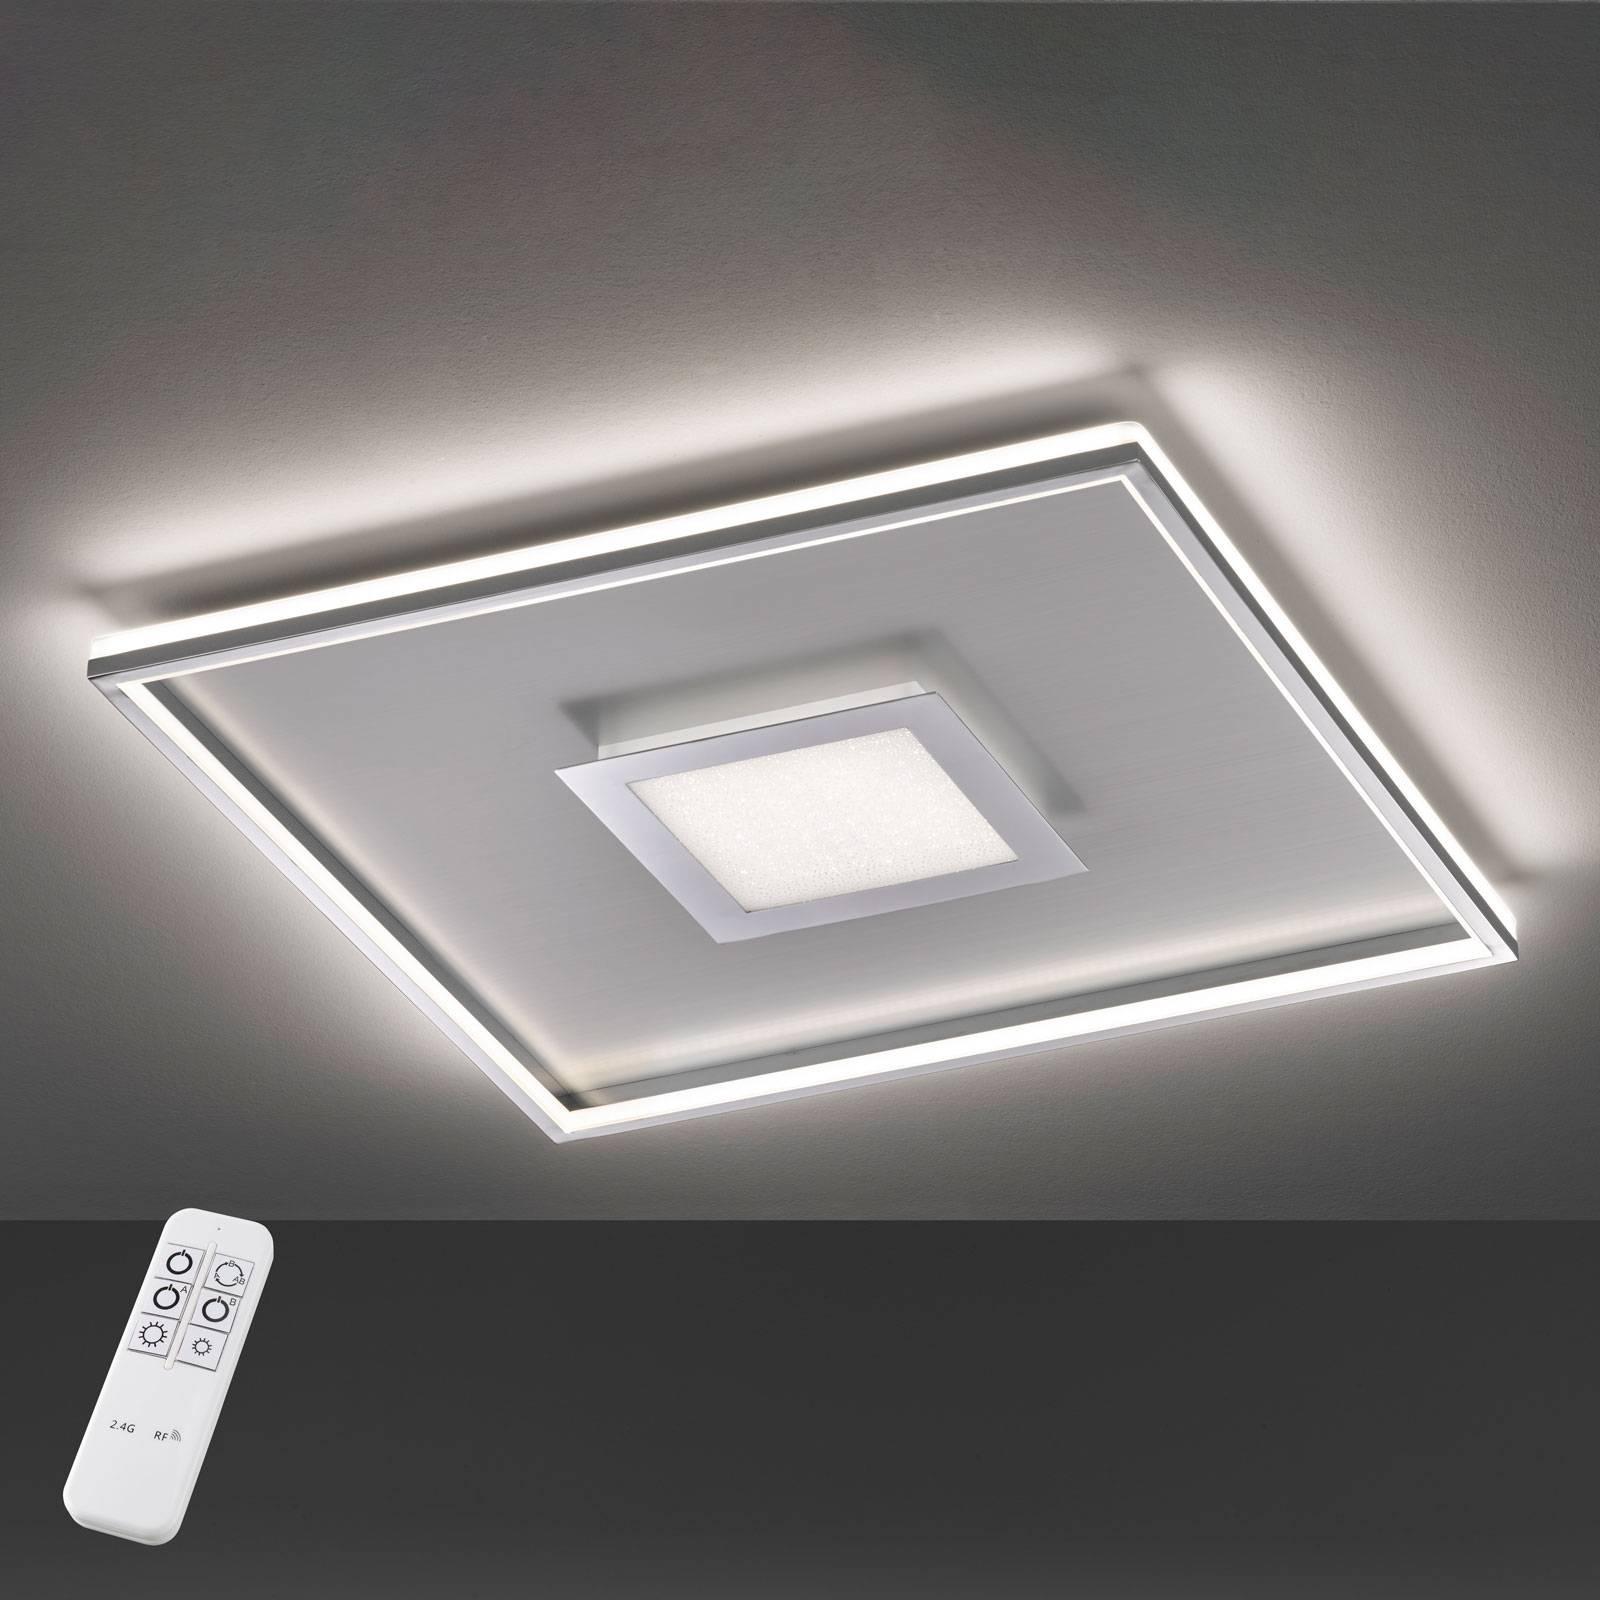 LED plafondlamp Bug vierkant, chroom 40x40cm